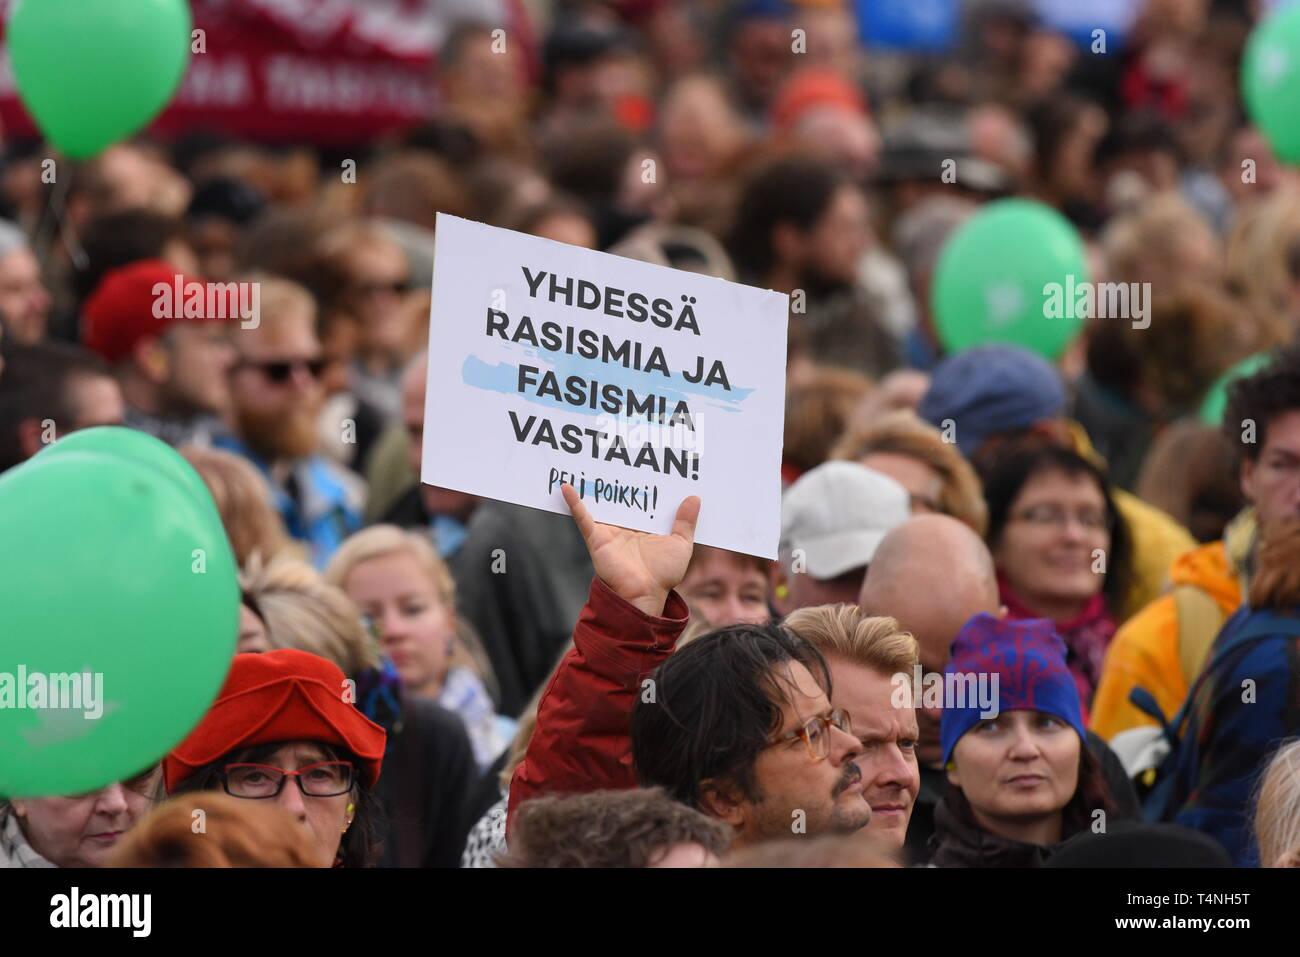 Helsinki, Finland - September 24, 2016: Peli poikki - Rikotaan hiljaisuus - protest rally against racism and right wing extremist violence in Helsinki - Stock Image